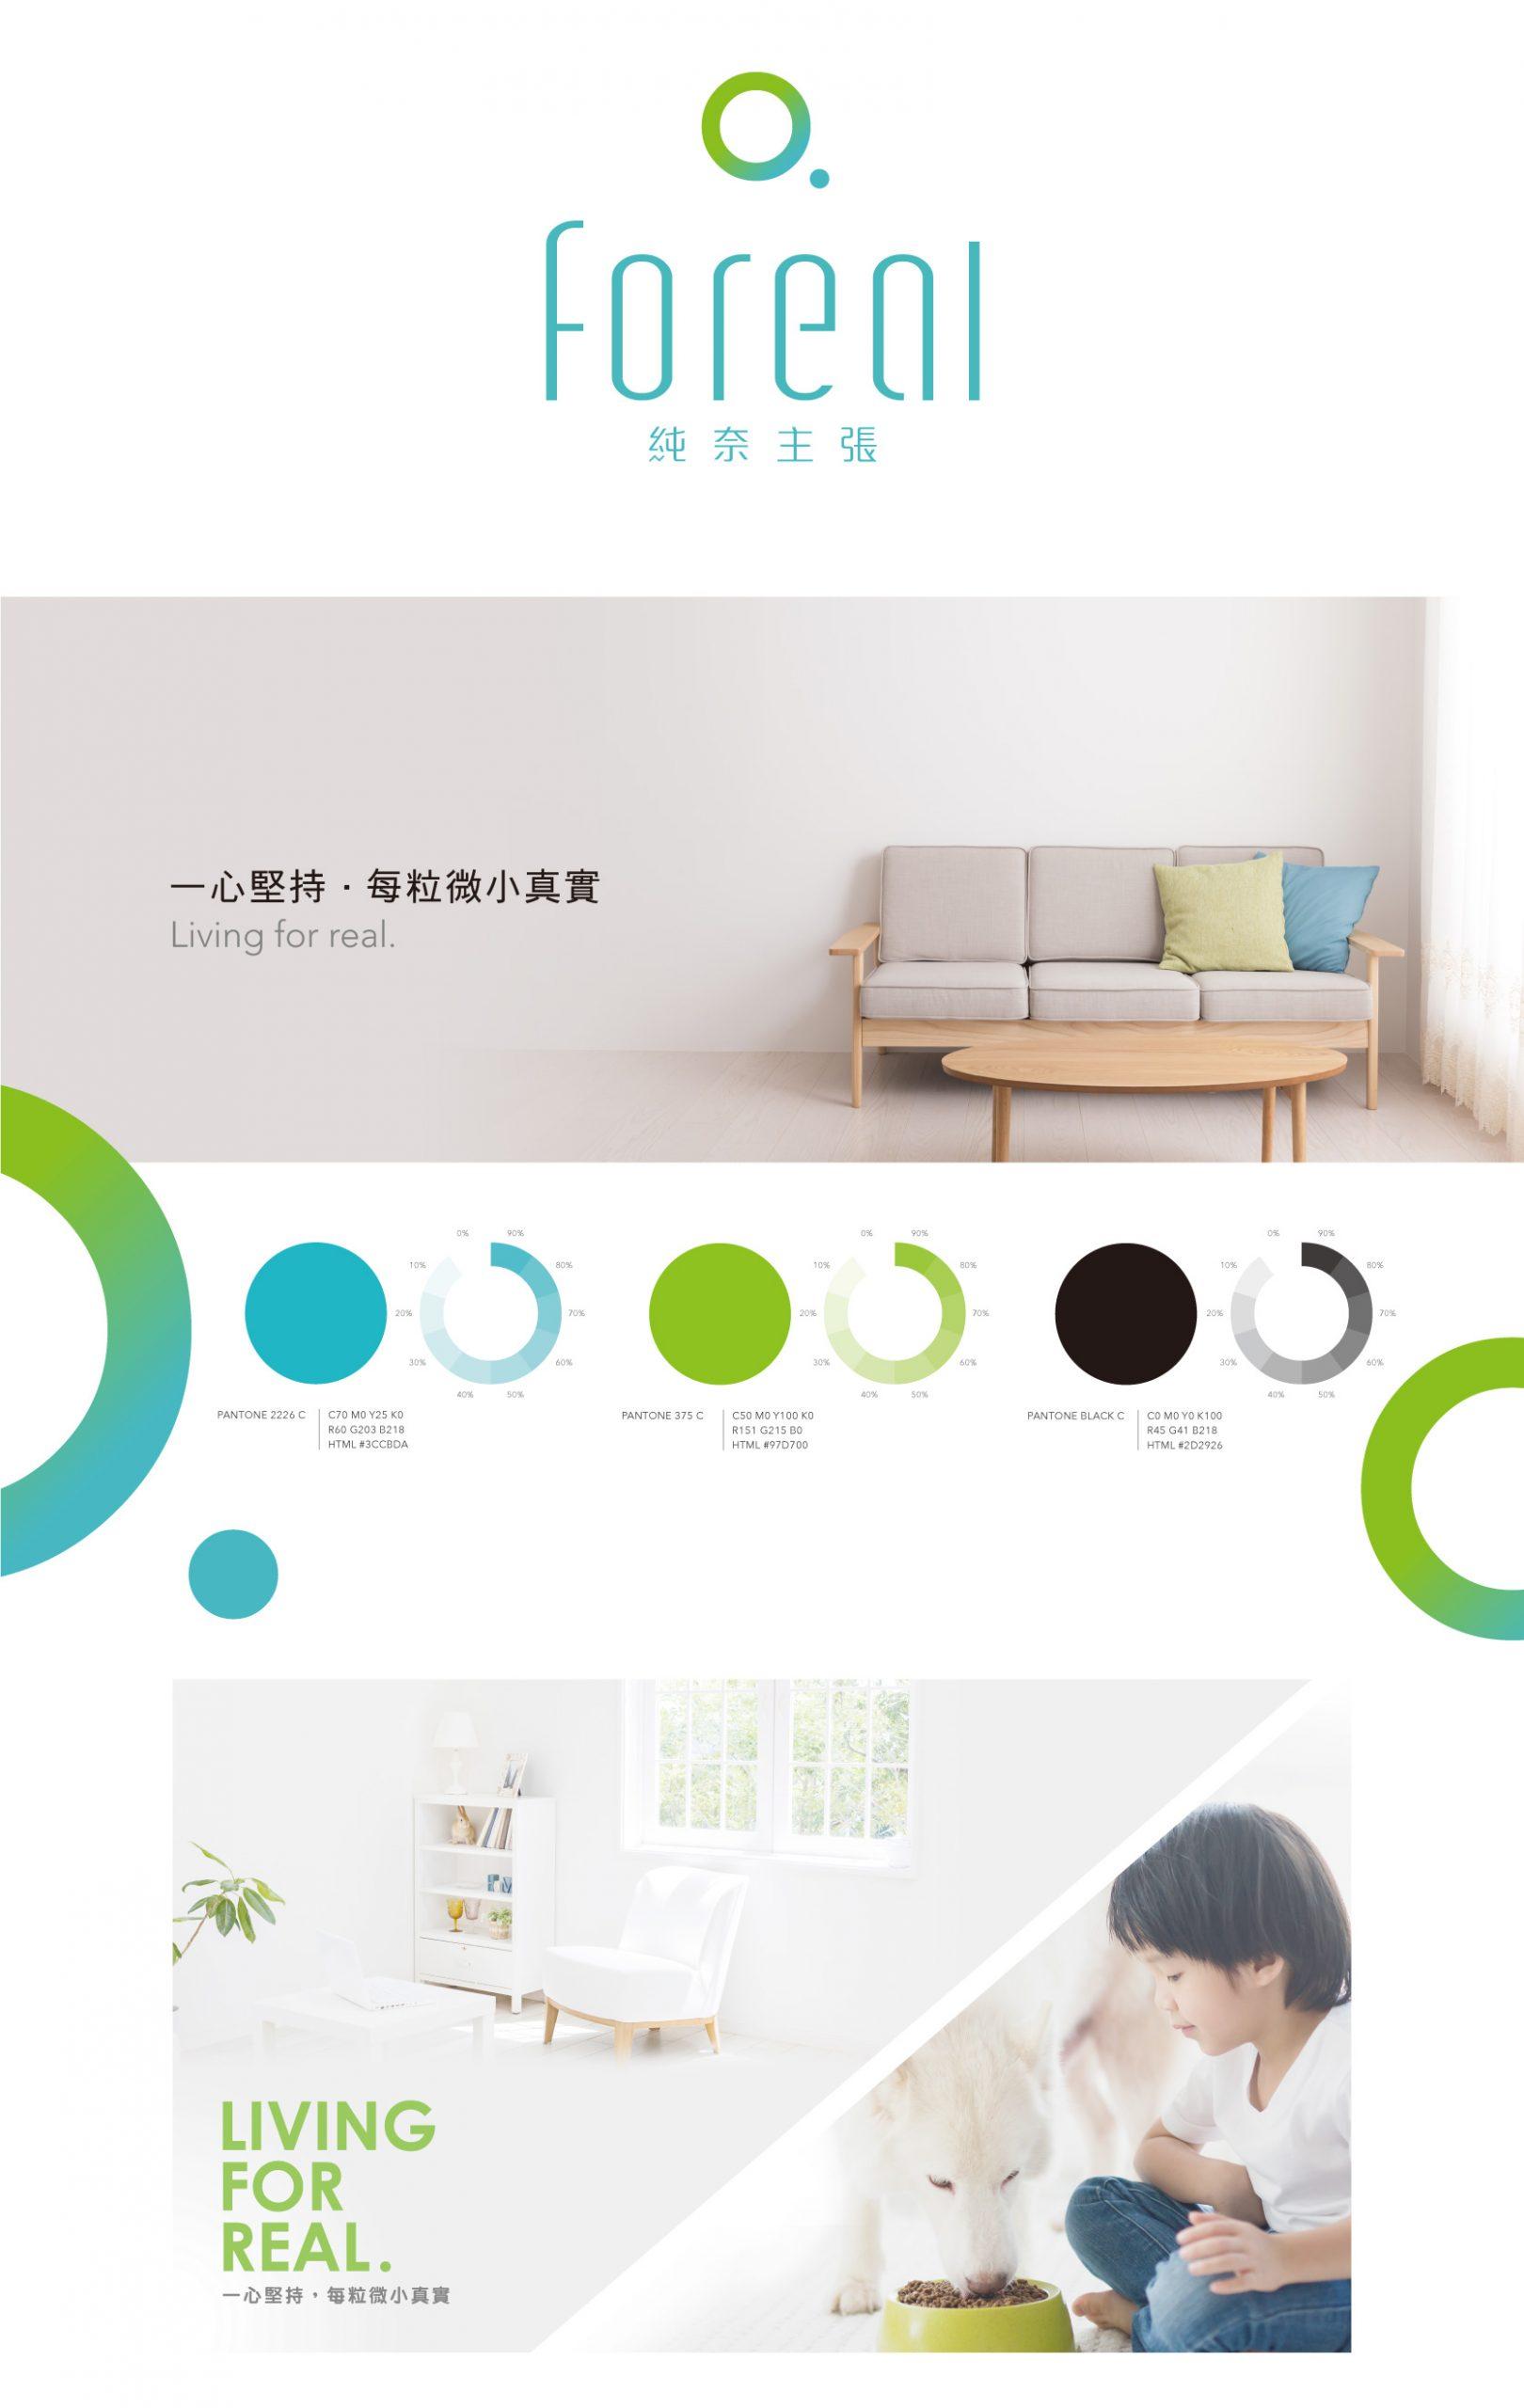 Foreal 純奈主張 品牌規劃設計02